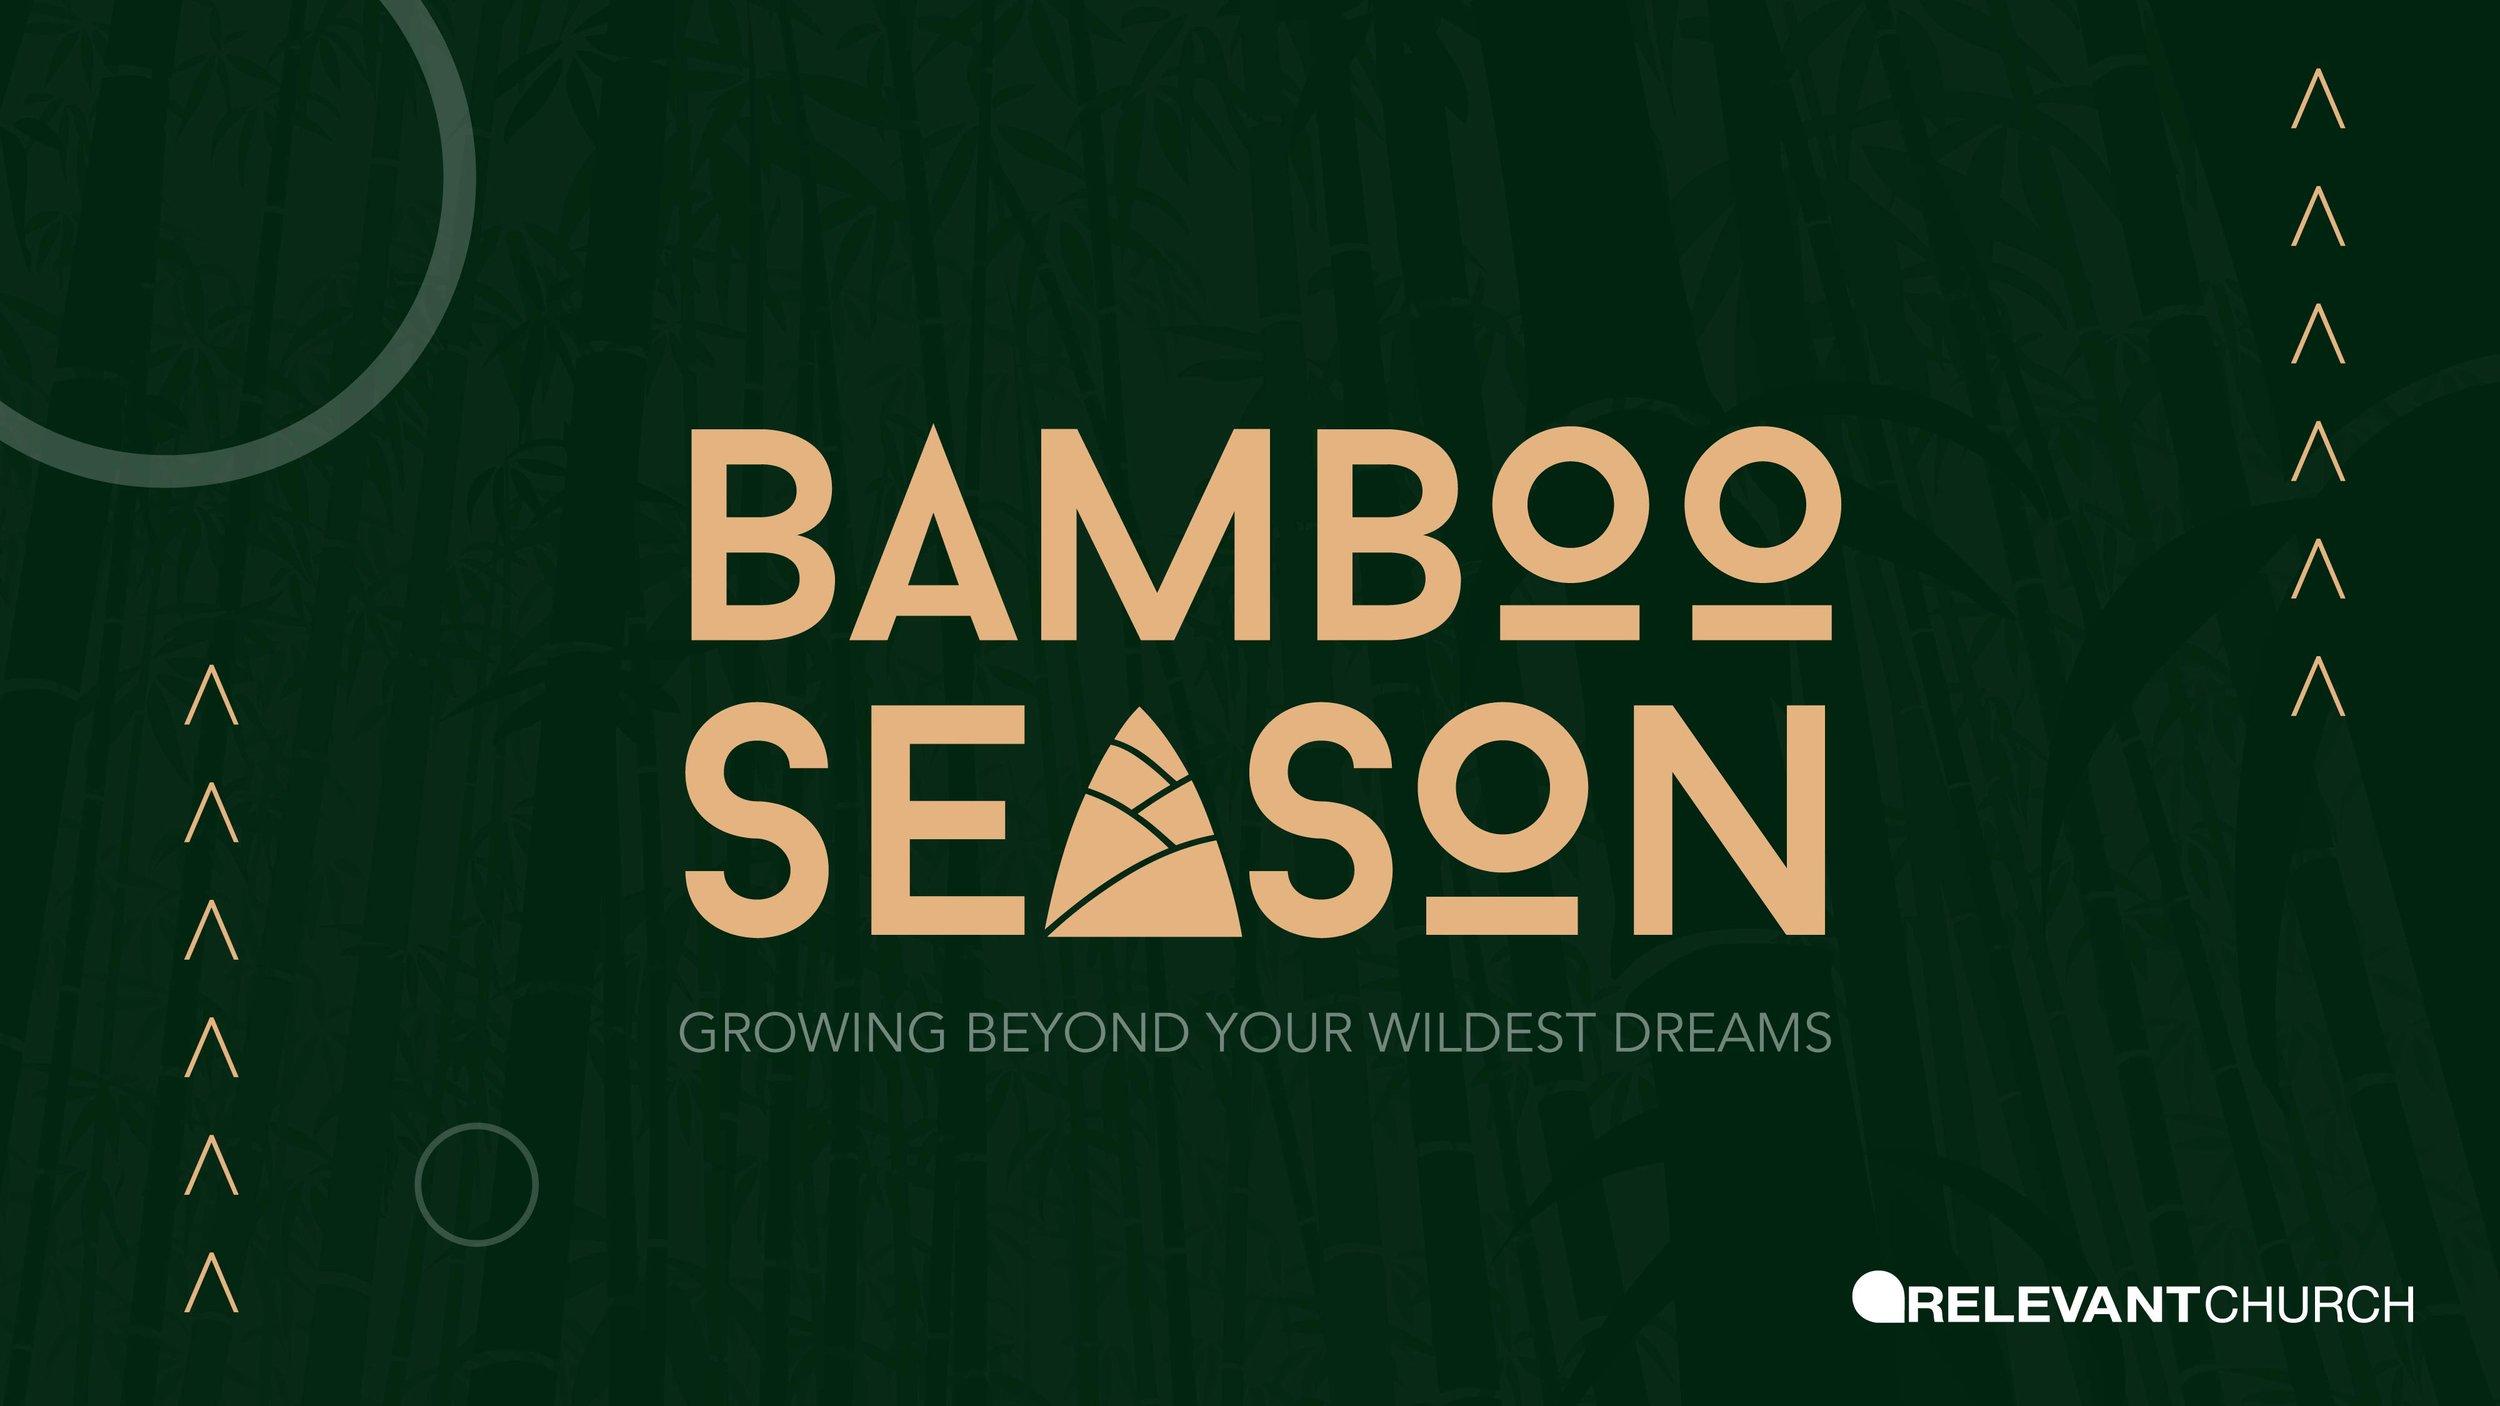 bamboo season 1920x1080.jpg